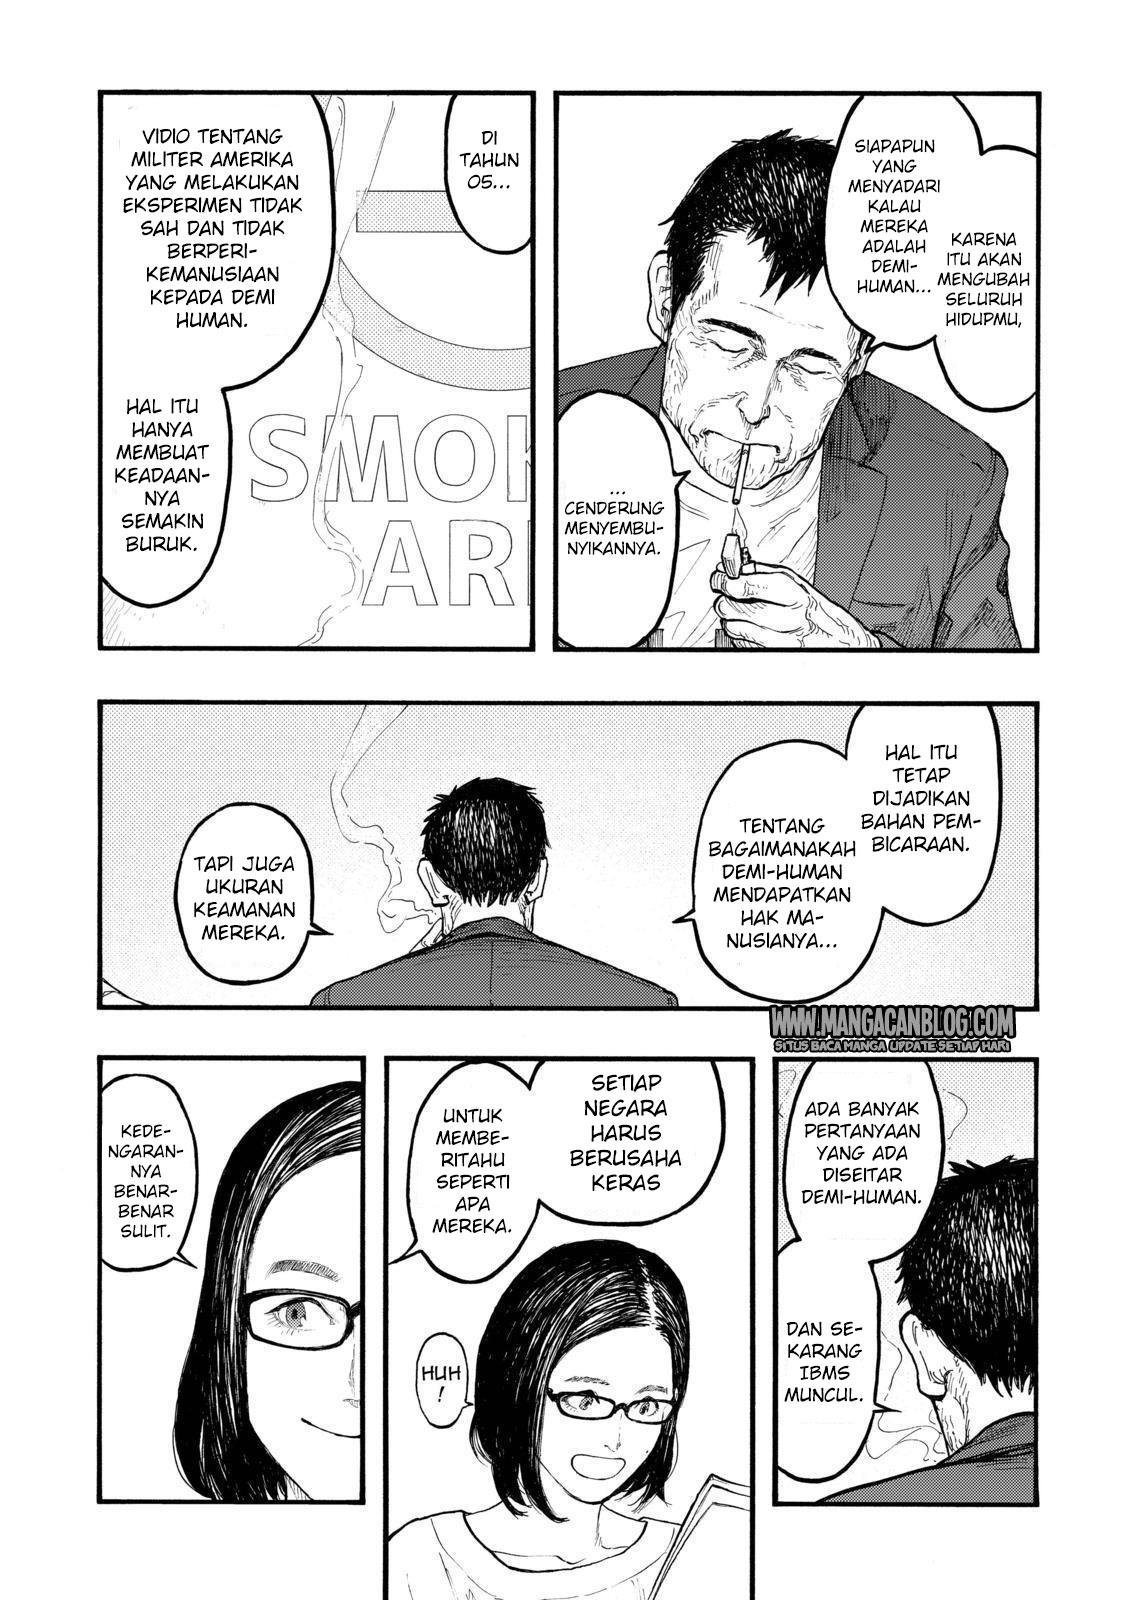 Dilarang COPAS - situs resmi www.mangacanblog.com - Komik ajin 046 - selamat pagi, sampai jumpa besok 47 Indonesia ajin 046 - selamat pagi, sampai jumpa besok Terbaru 21|Baca Manga Komik Indonesia|Mangacan